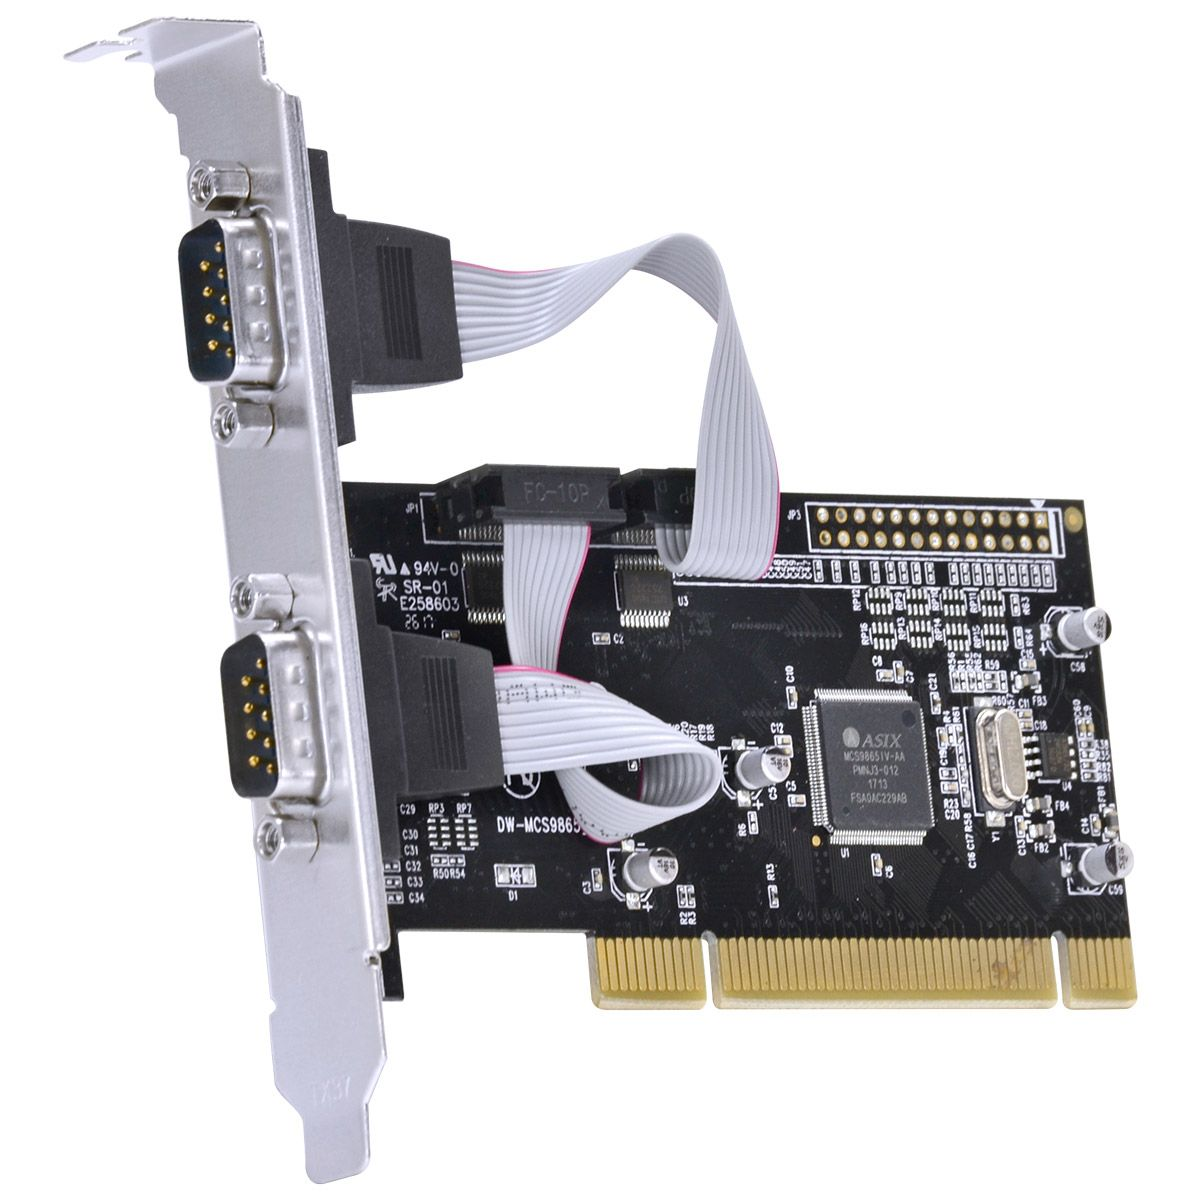 PLACA SERIAL COM 2 SAÍDAS RS232, RS485, RS422 IEEE1284 PCI X - P2IE-PCI vinik